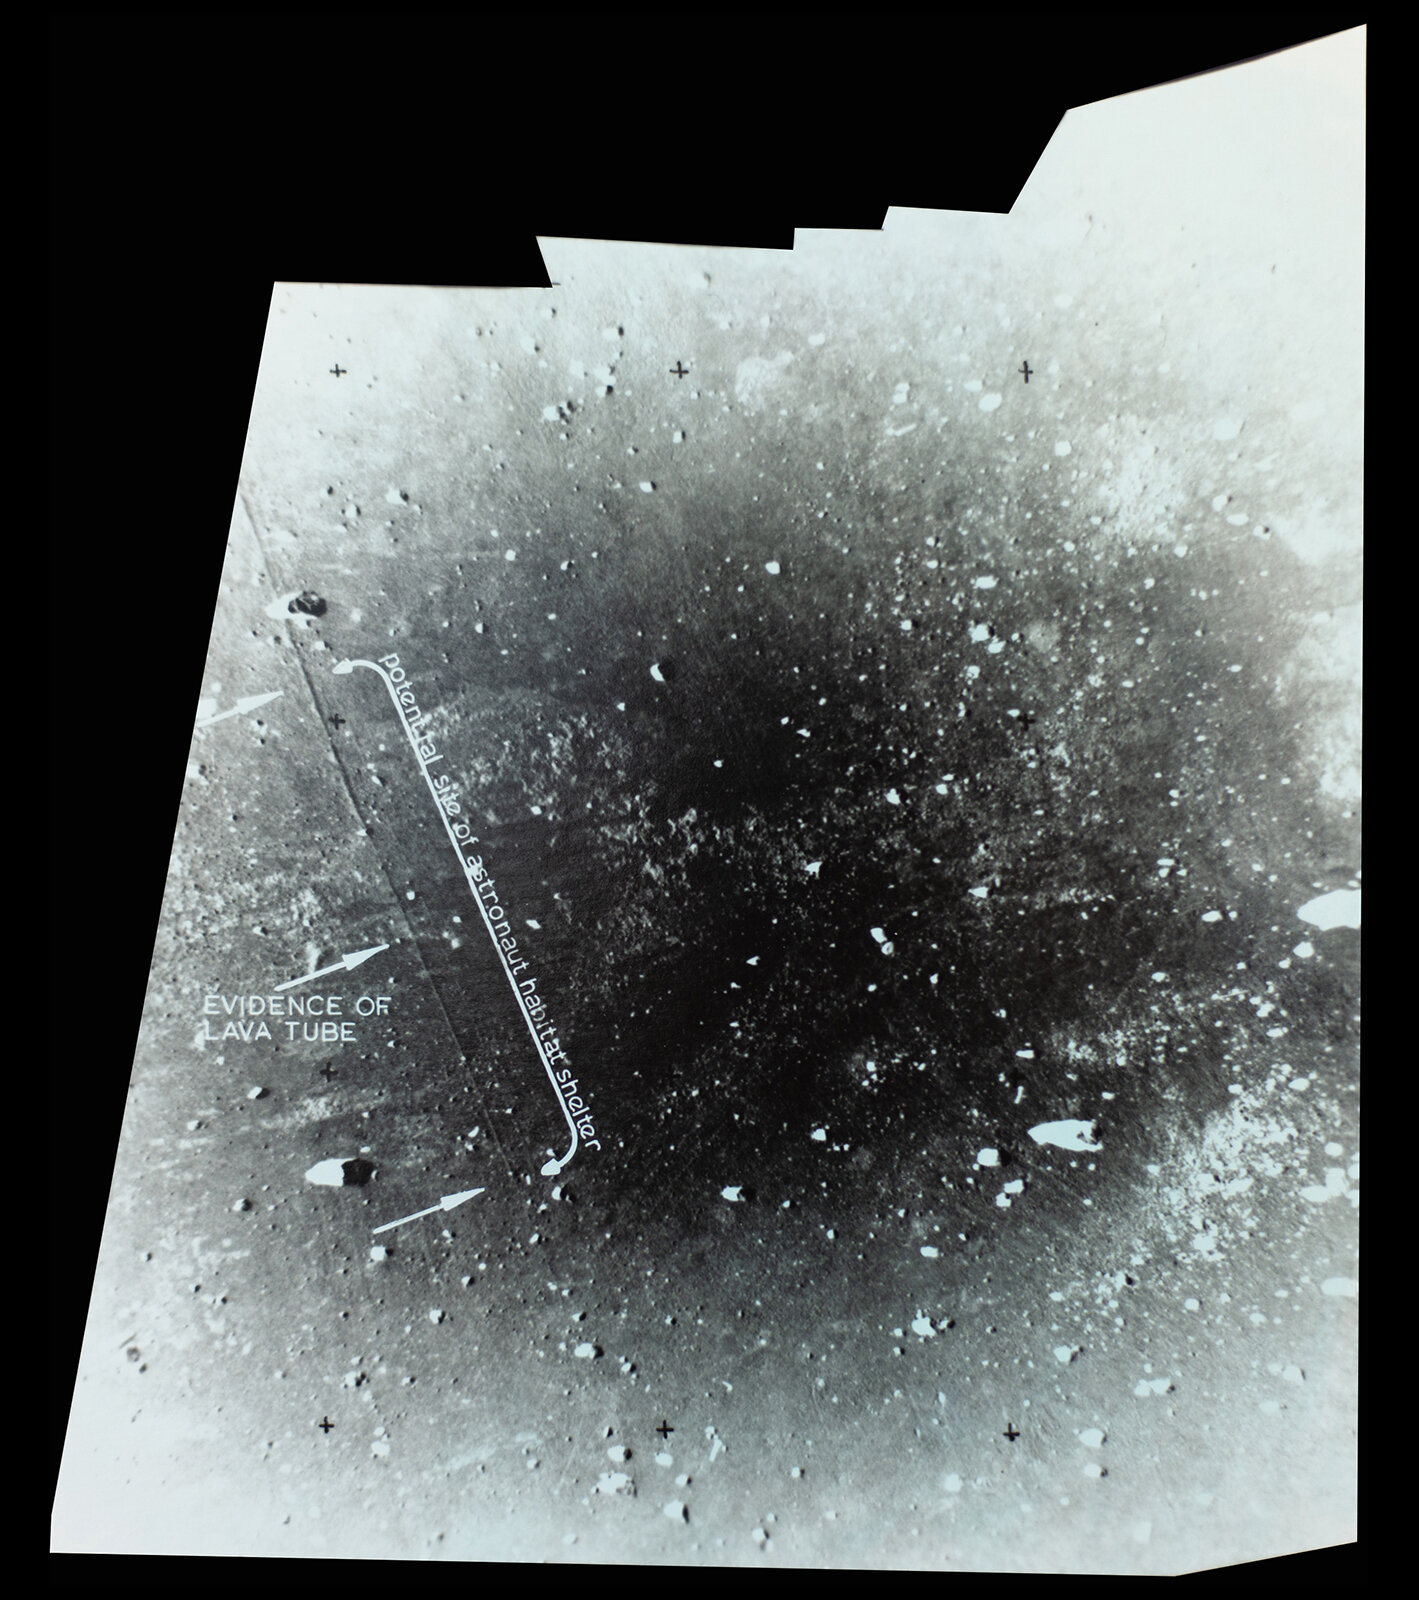 Evidence of Lava Tube